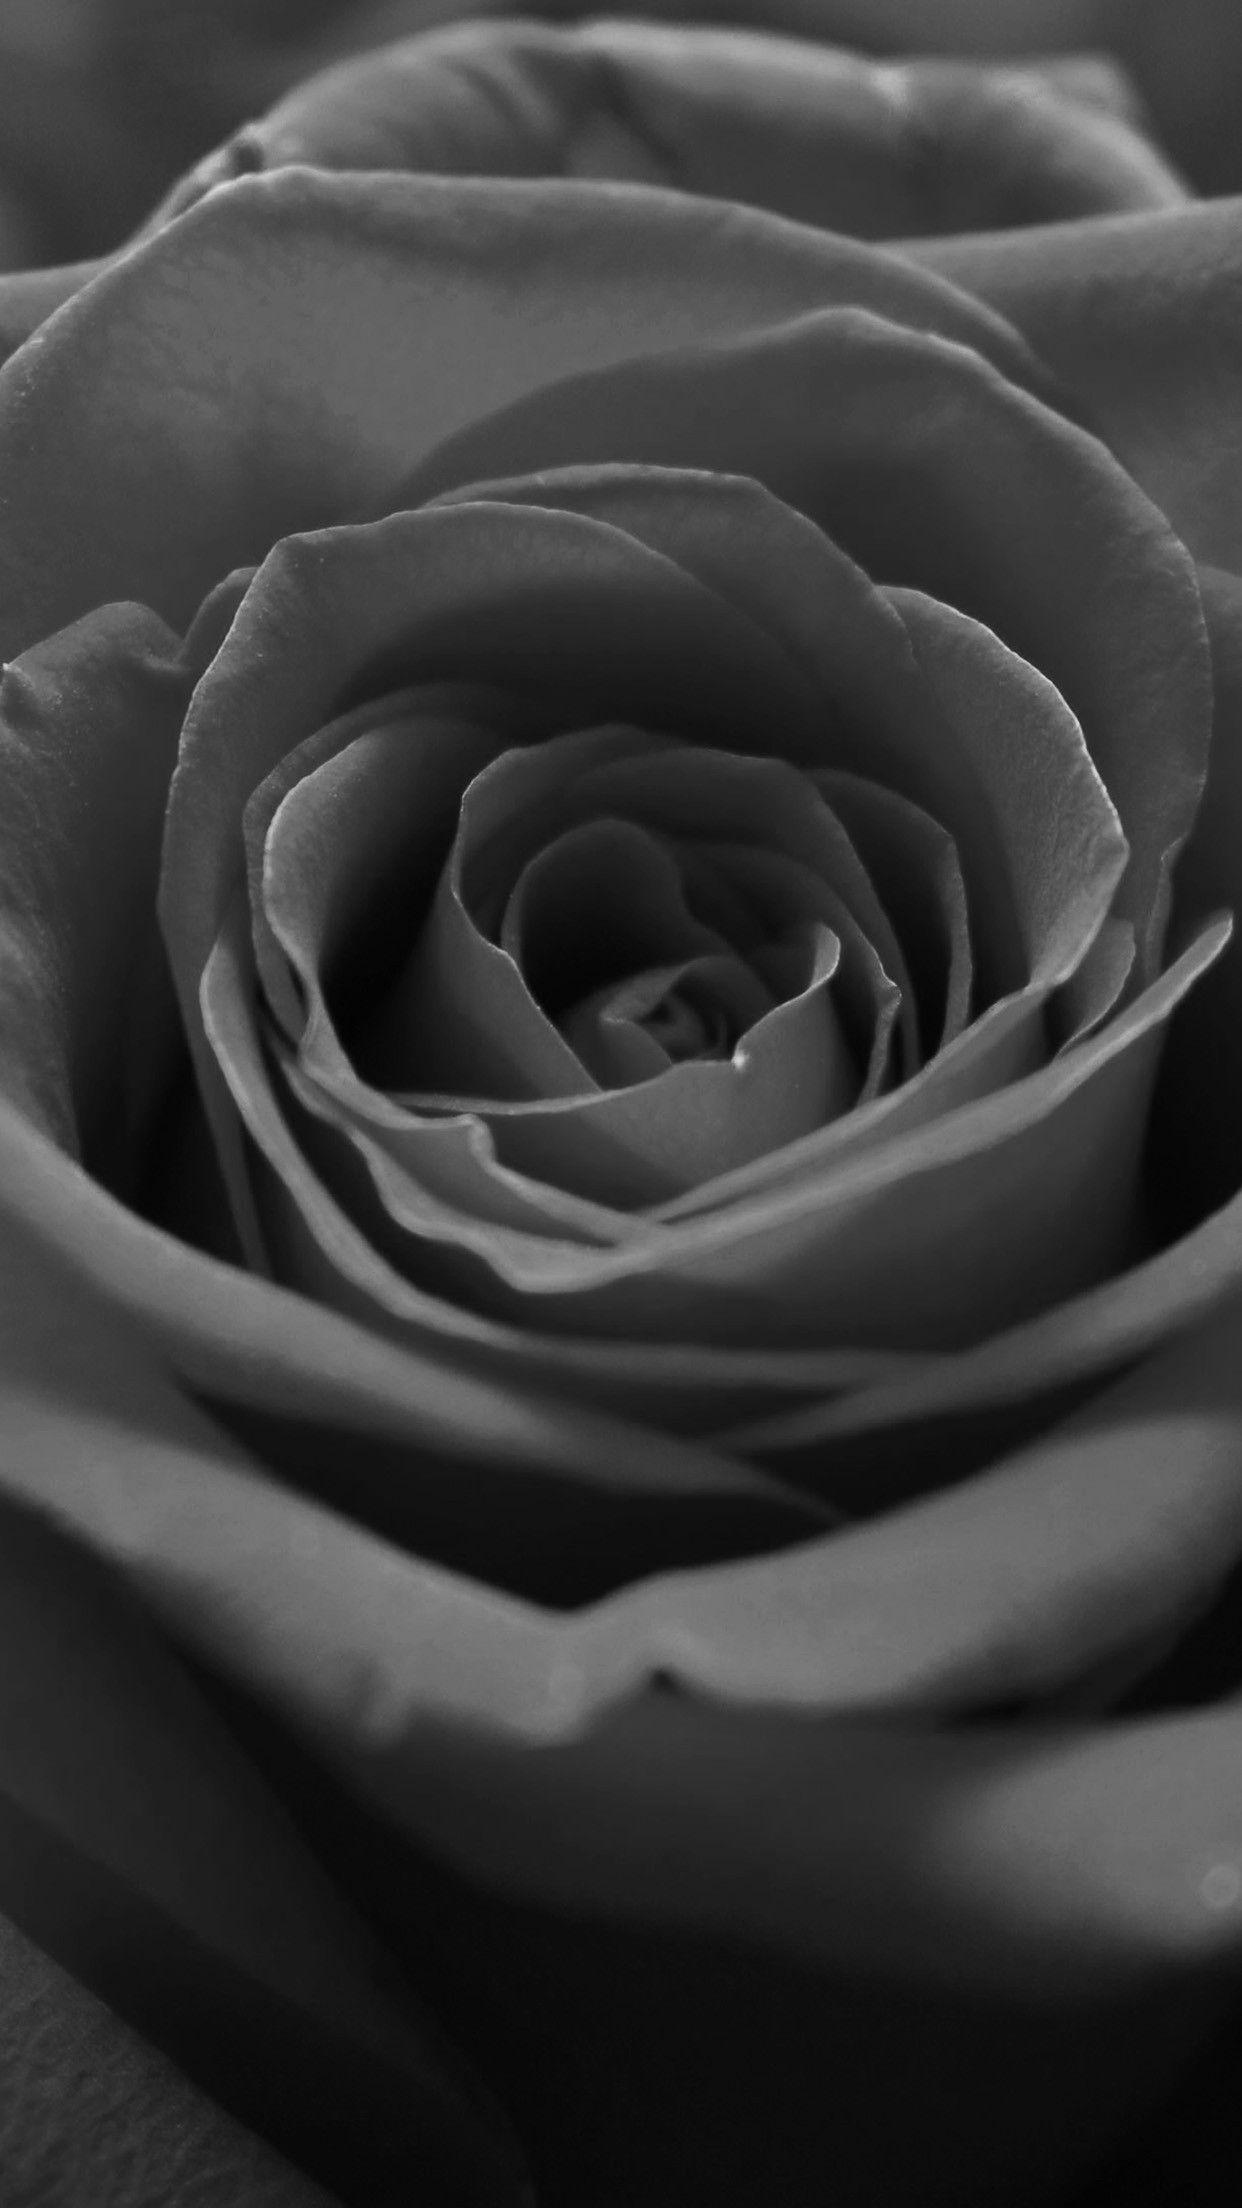 Black And White Macro Rose Flower Grey Dark Smartphone Wallpaper And Lockscreen Hd Check More At Https Phon Rose Wallpaper Grey Wallpaper Iphone Dark Flowers